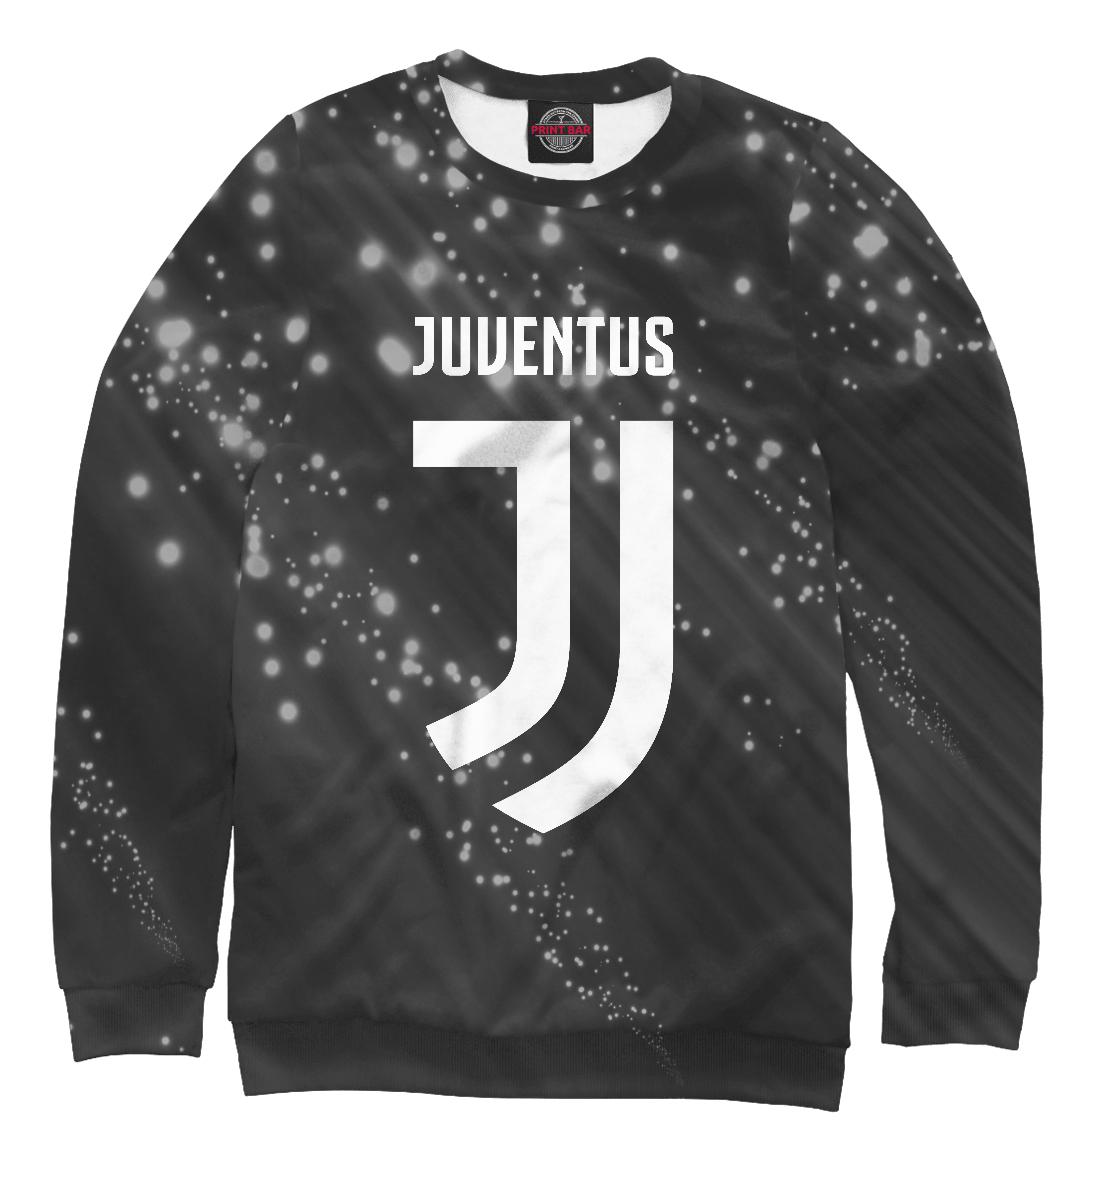 Купить Juventus Abstract, Printbar, Свитшоты, JUV-353875-swi-2